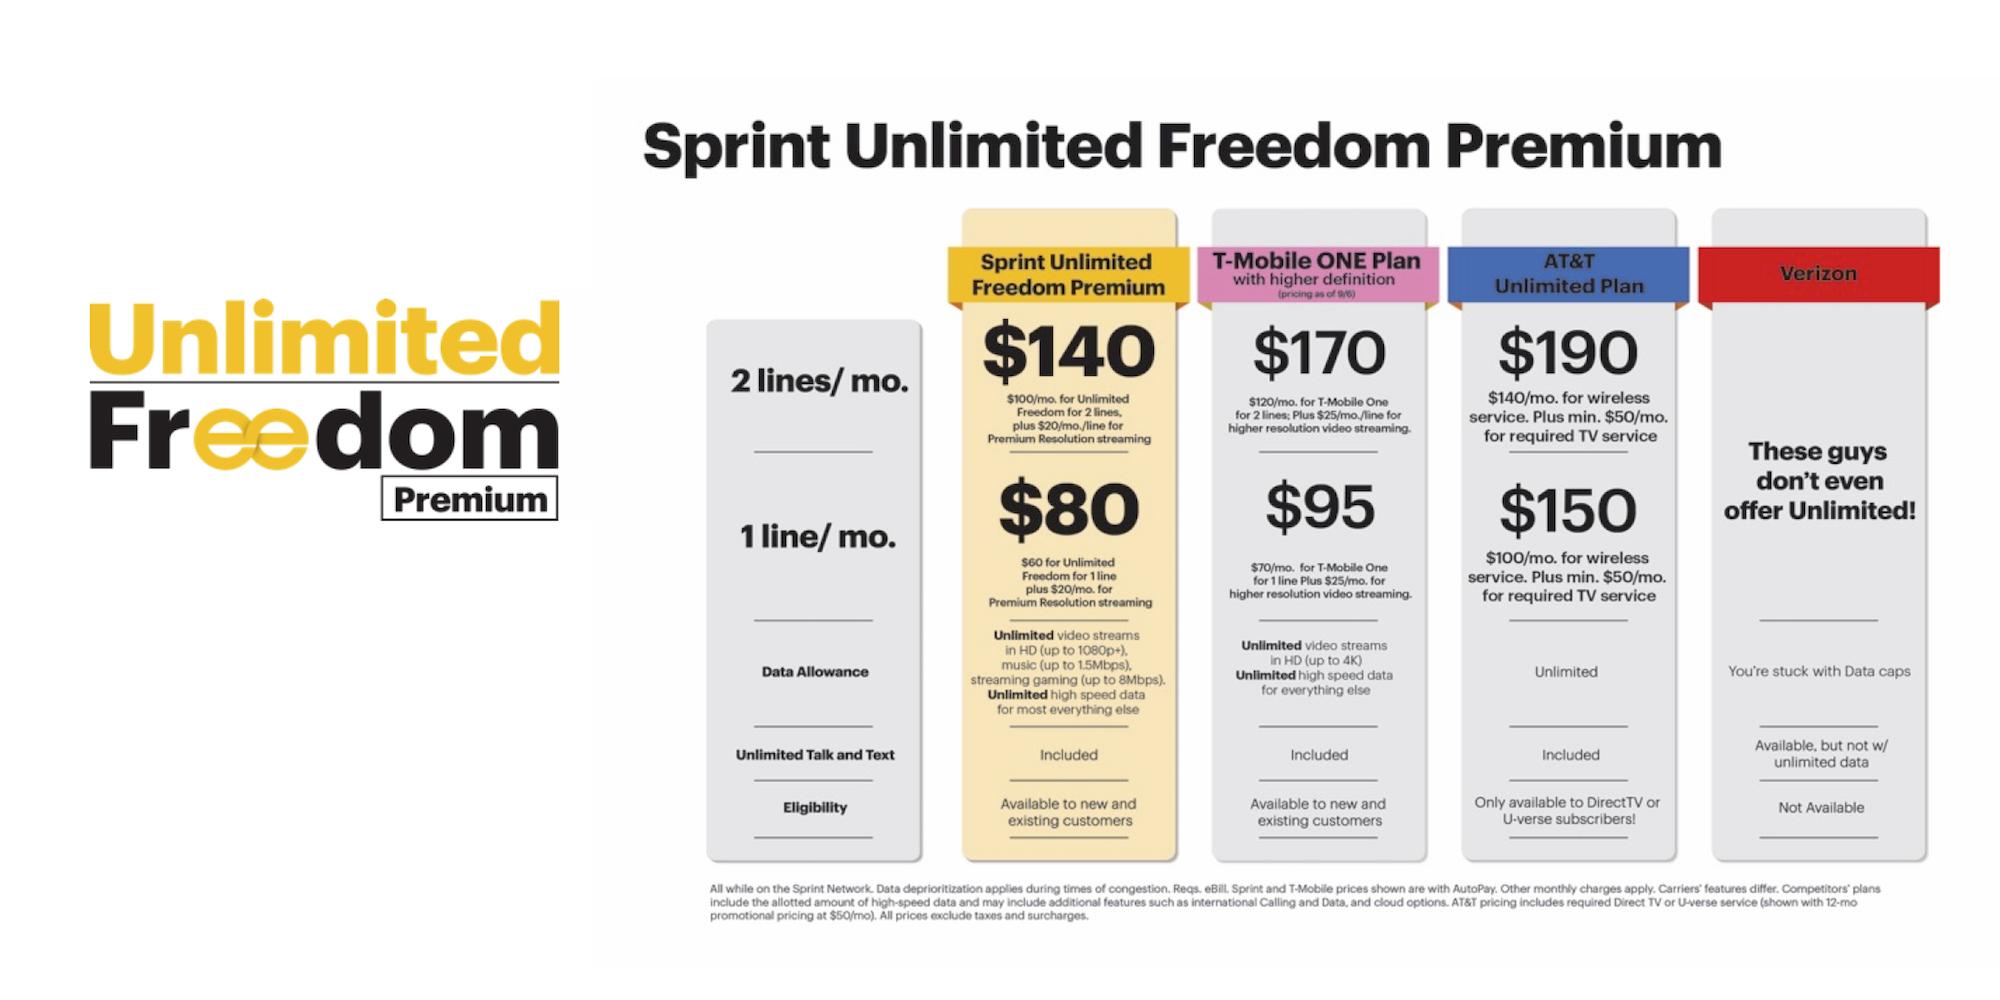 Sprint-unlimited-freedom-premium-plans